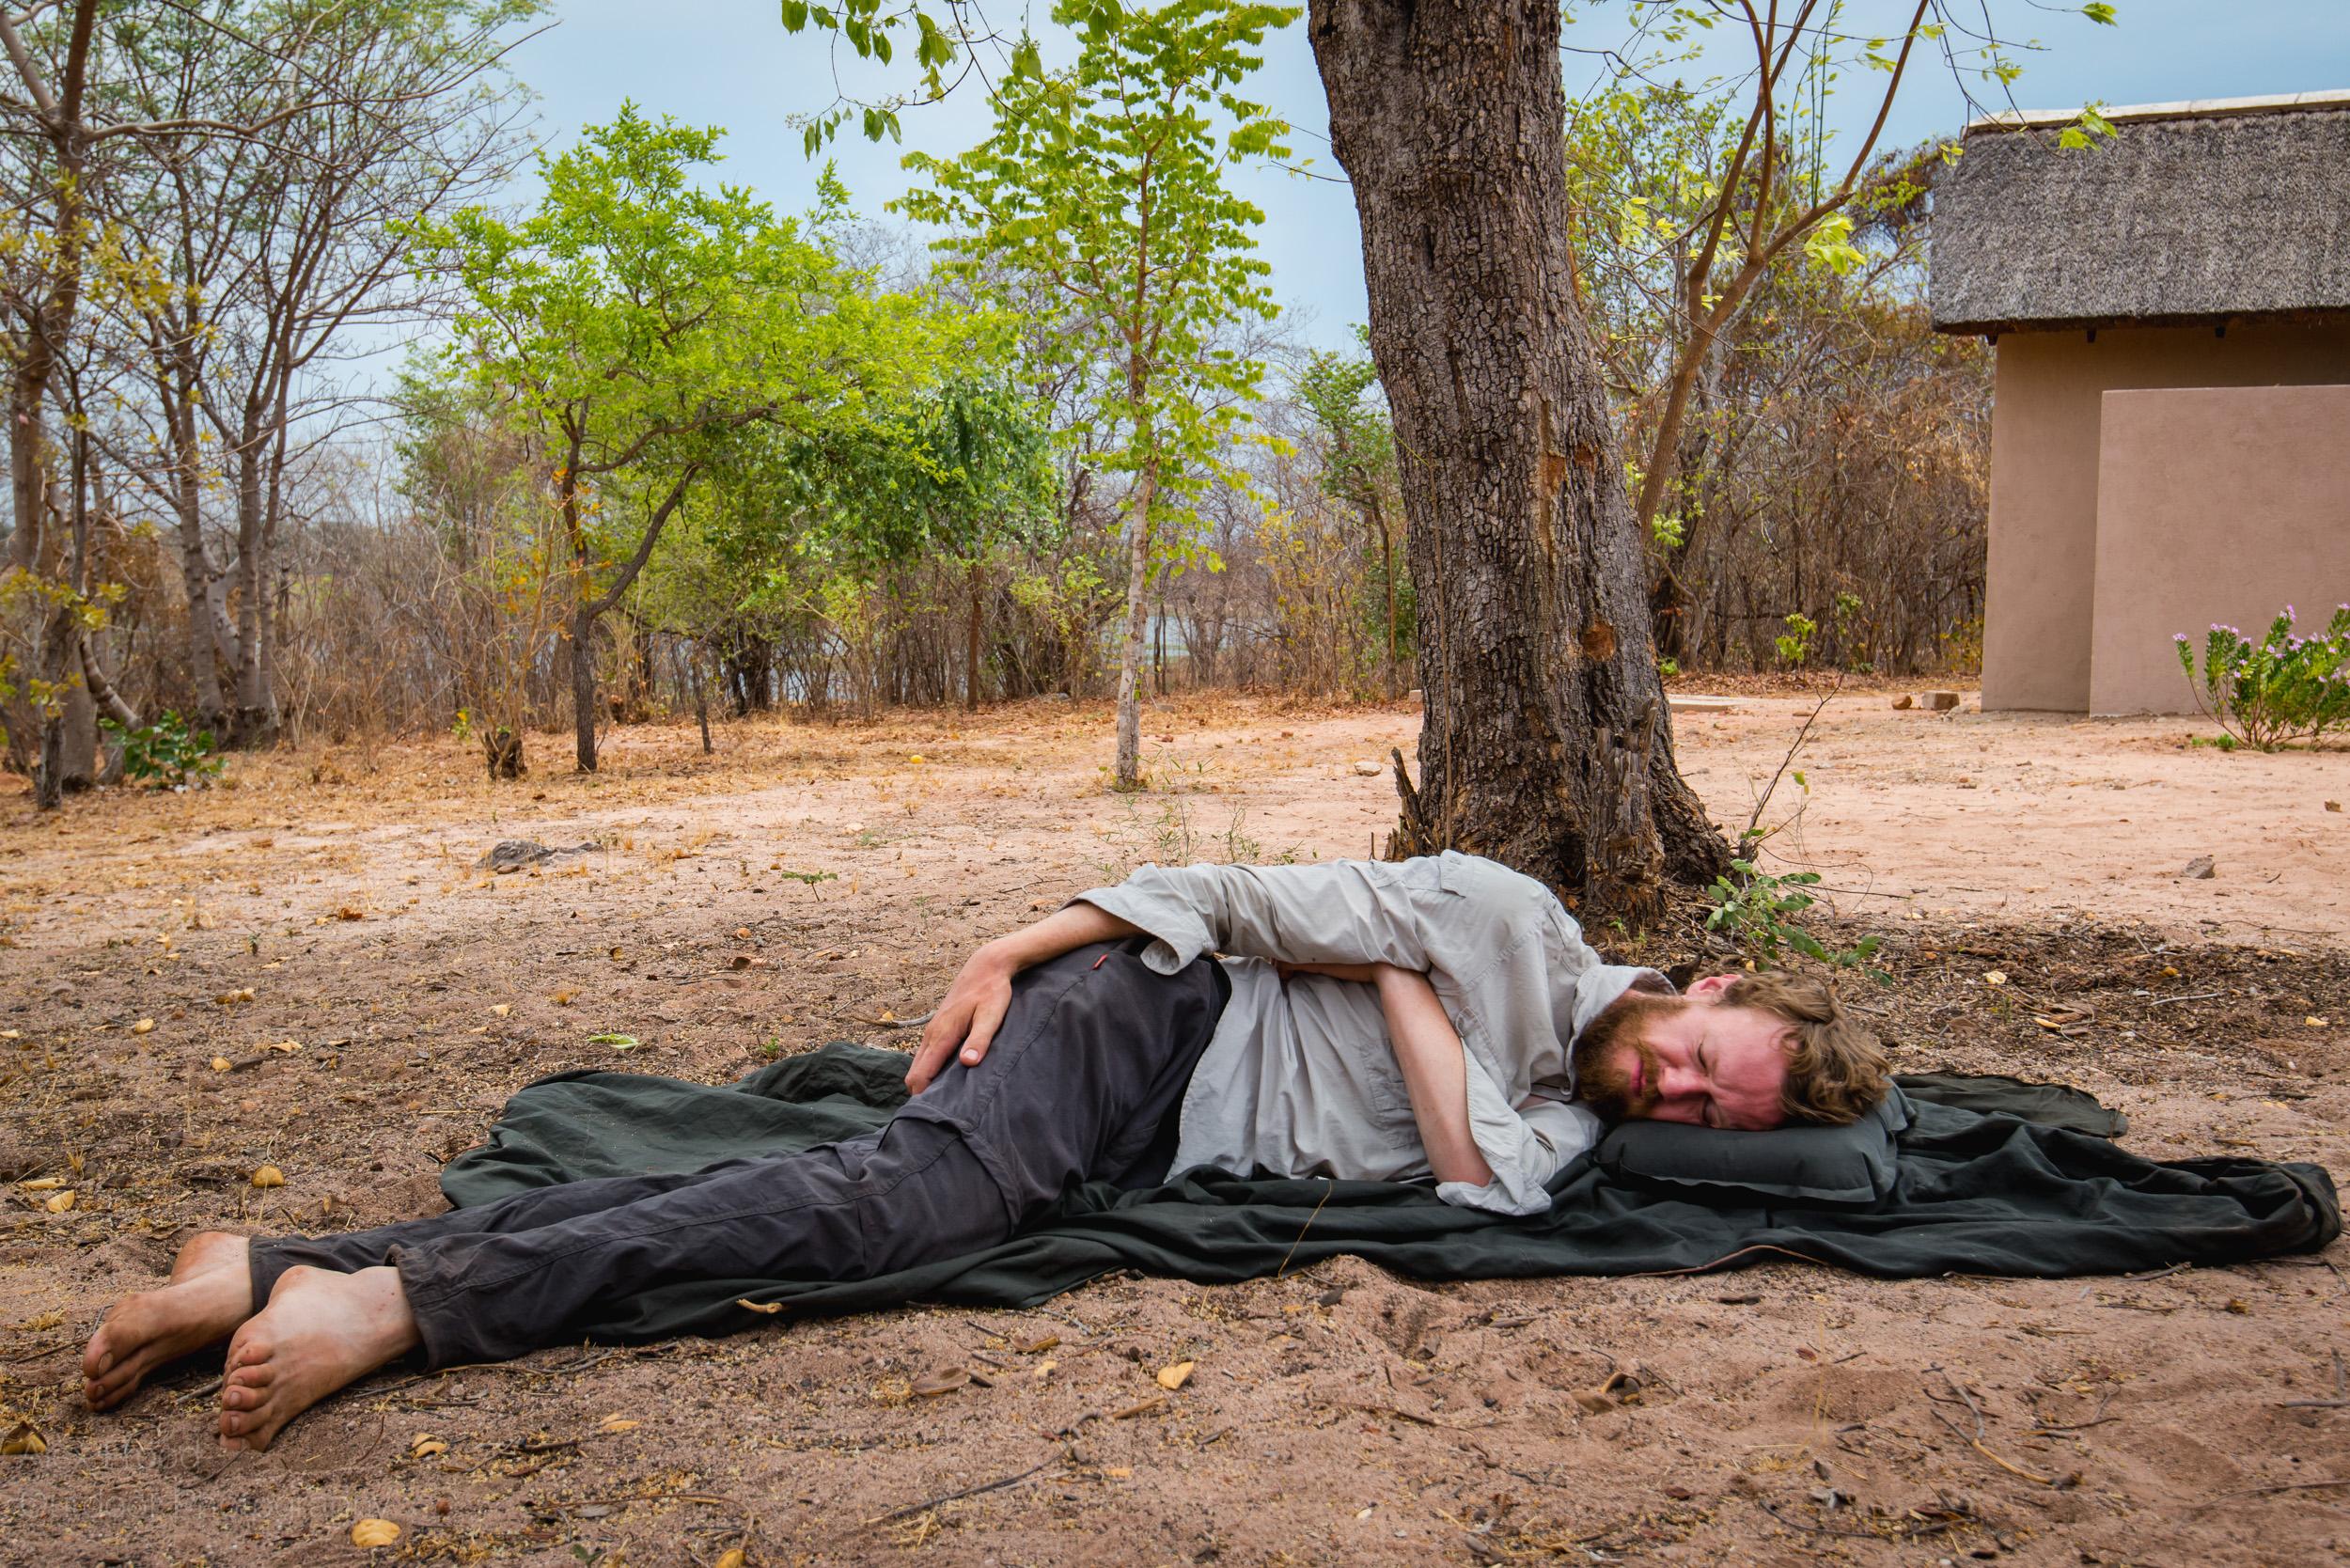 Zambia-16.jpg